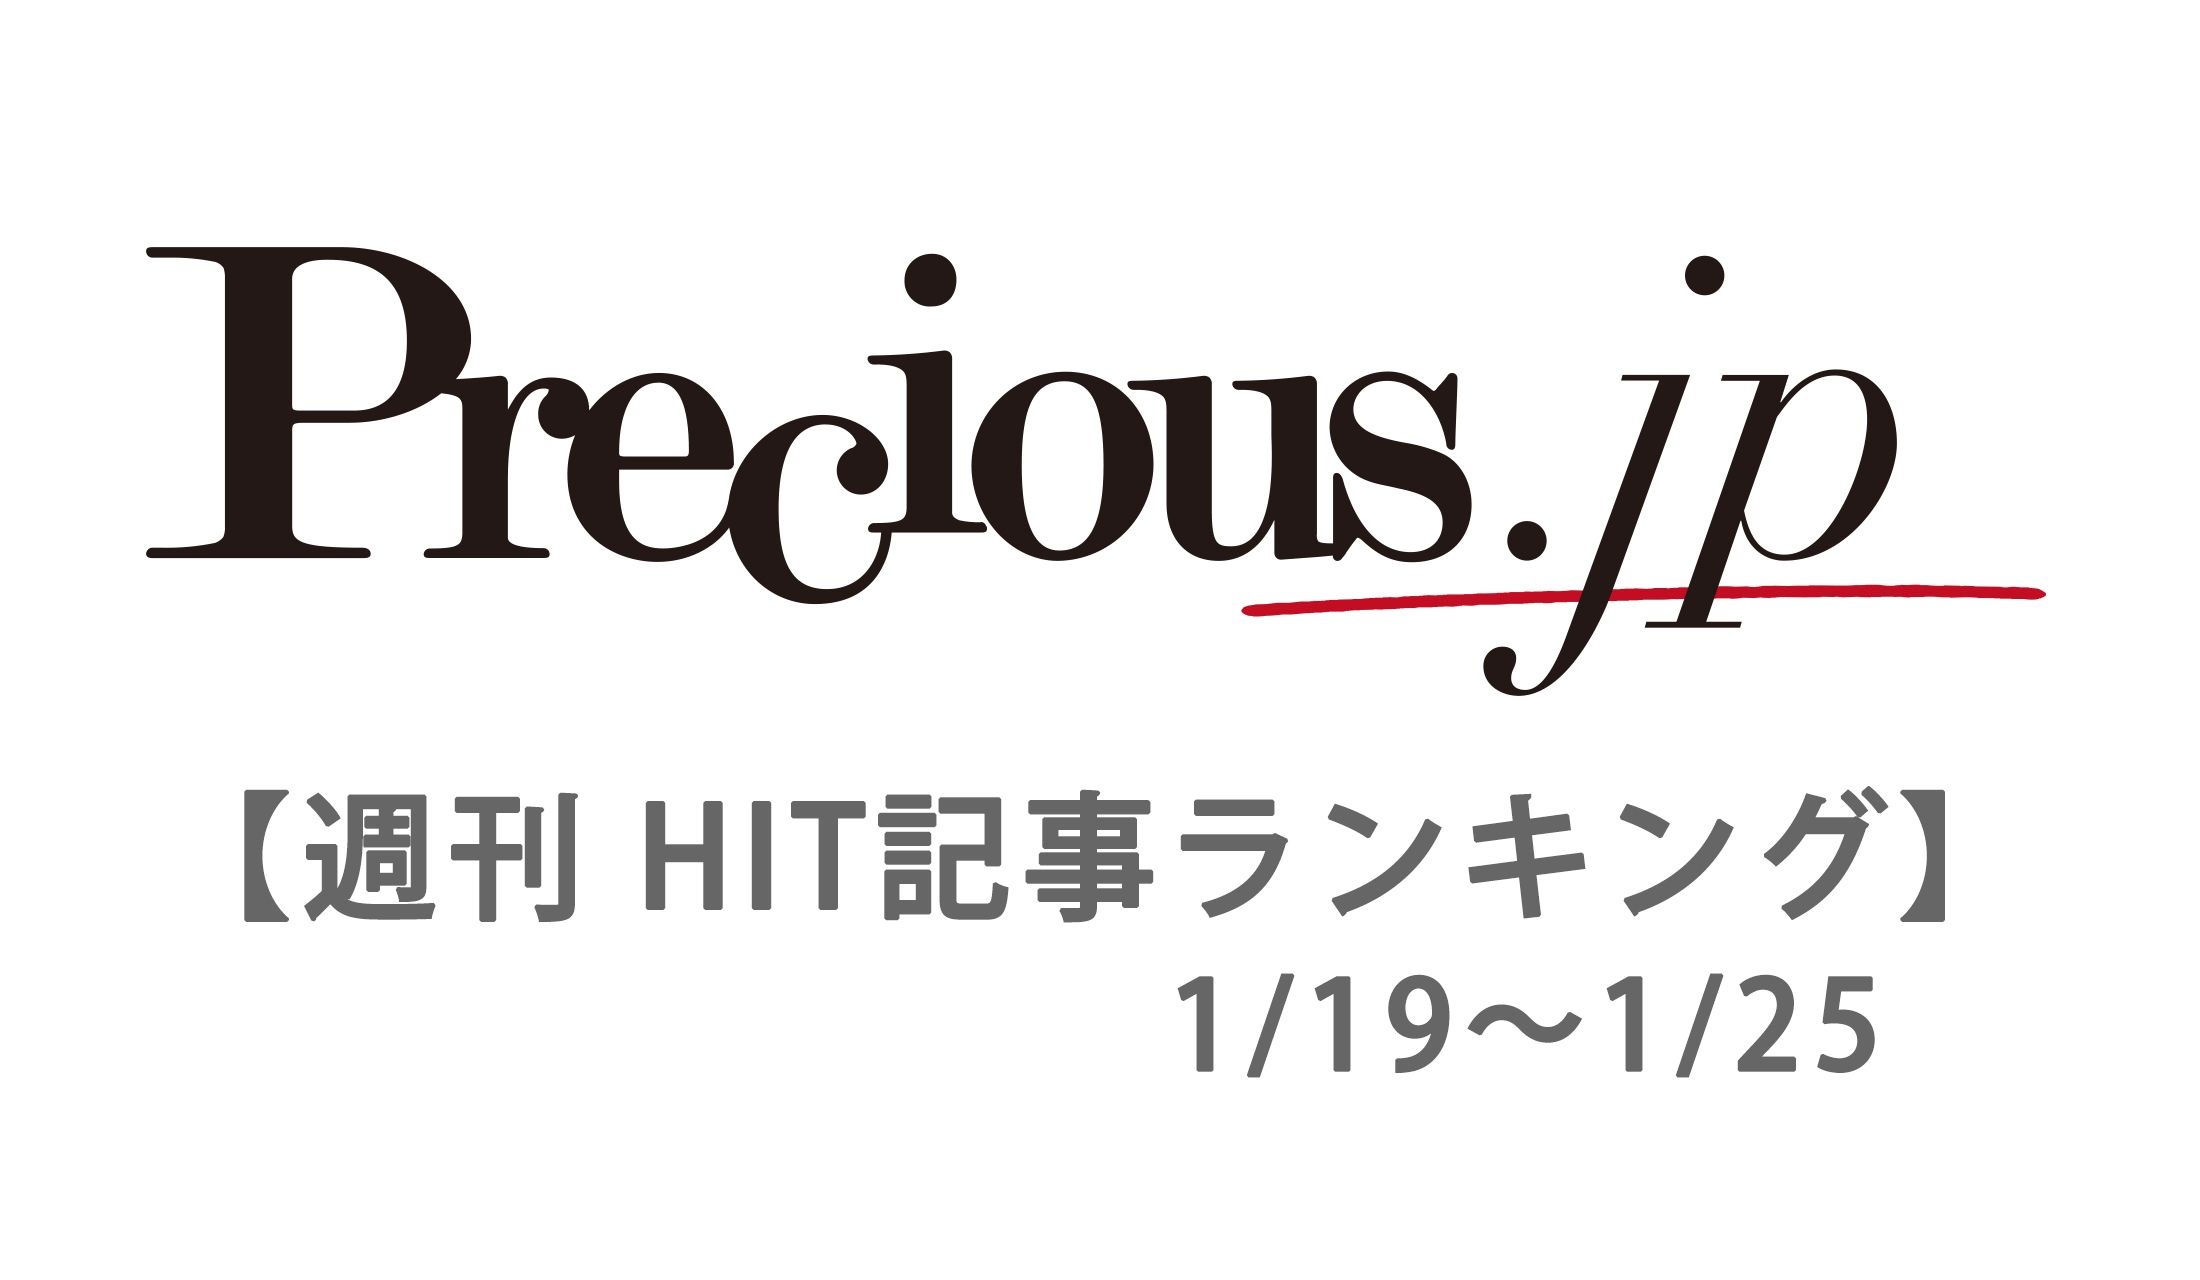 precious.jpの人気記事ランキング【1月19日~1月25日】